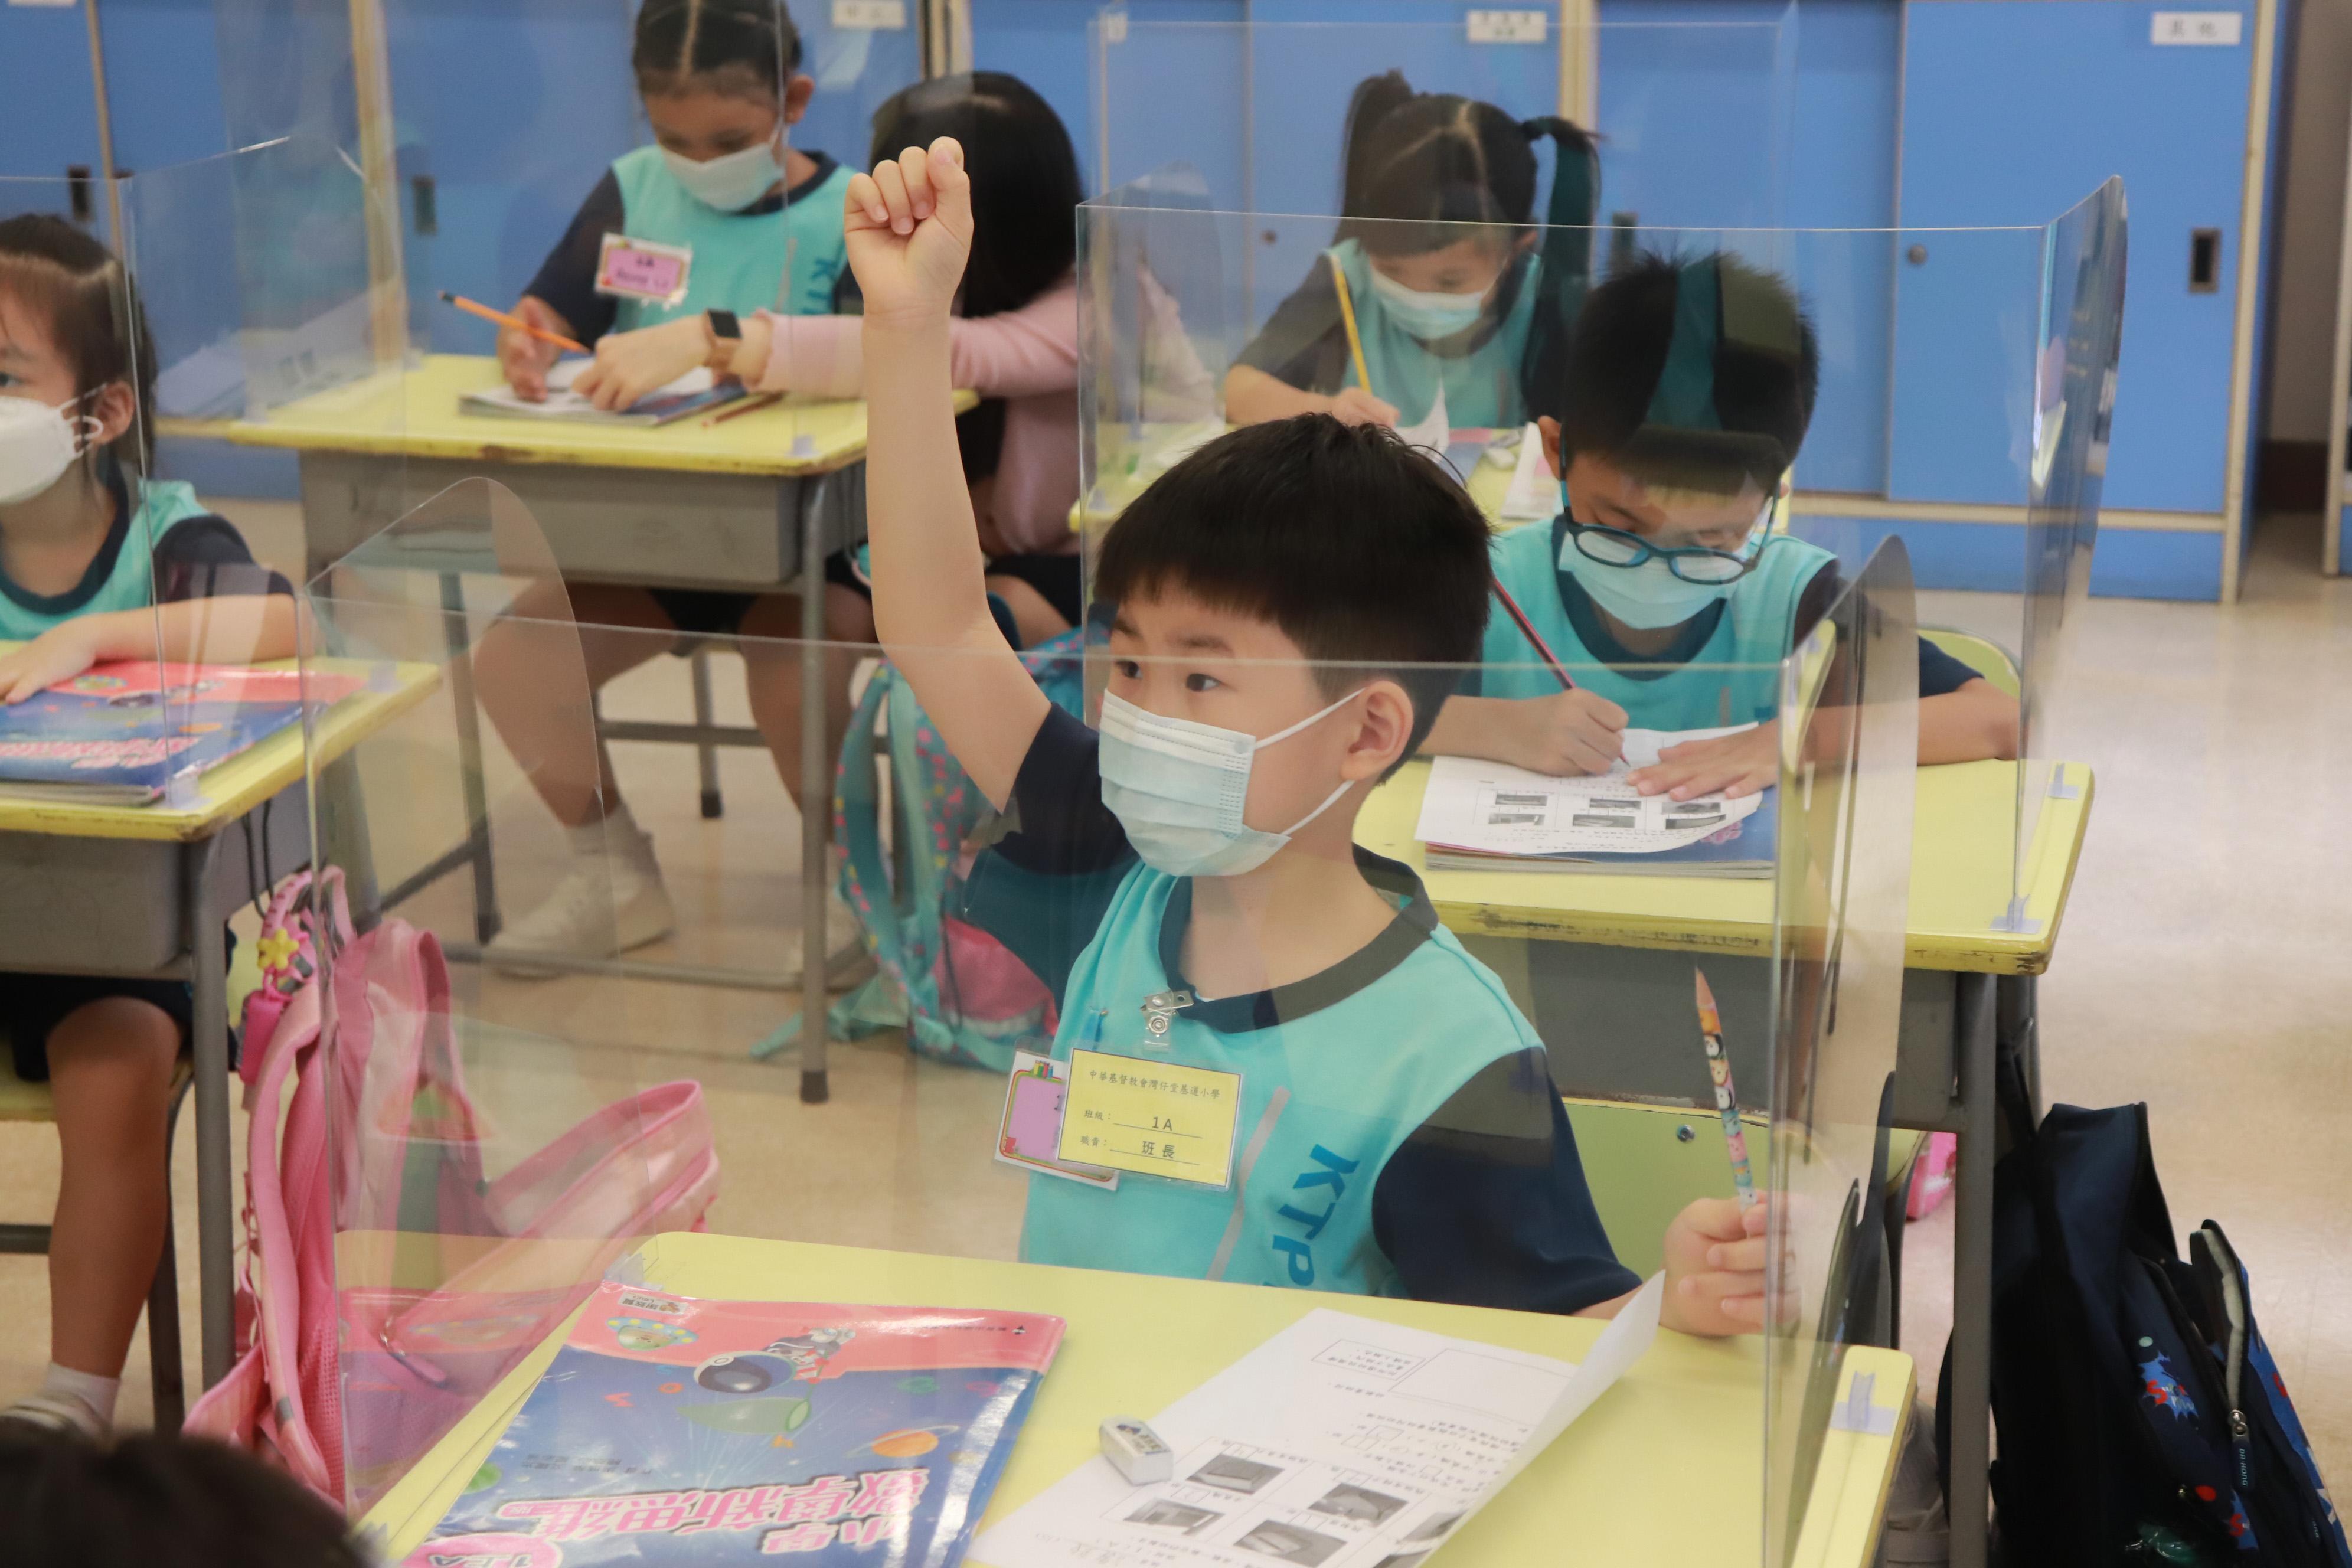 http://keito.school.hk/sites/default/files/img_6202.jpg